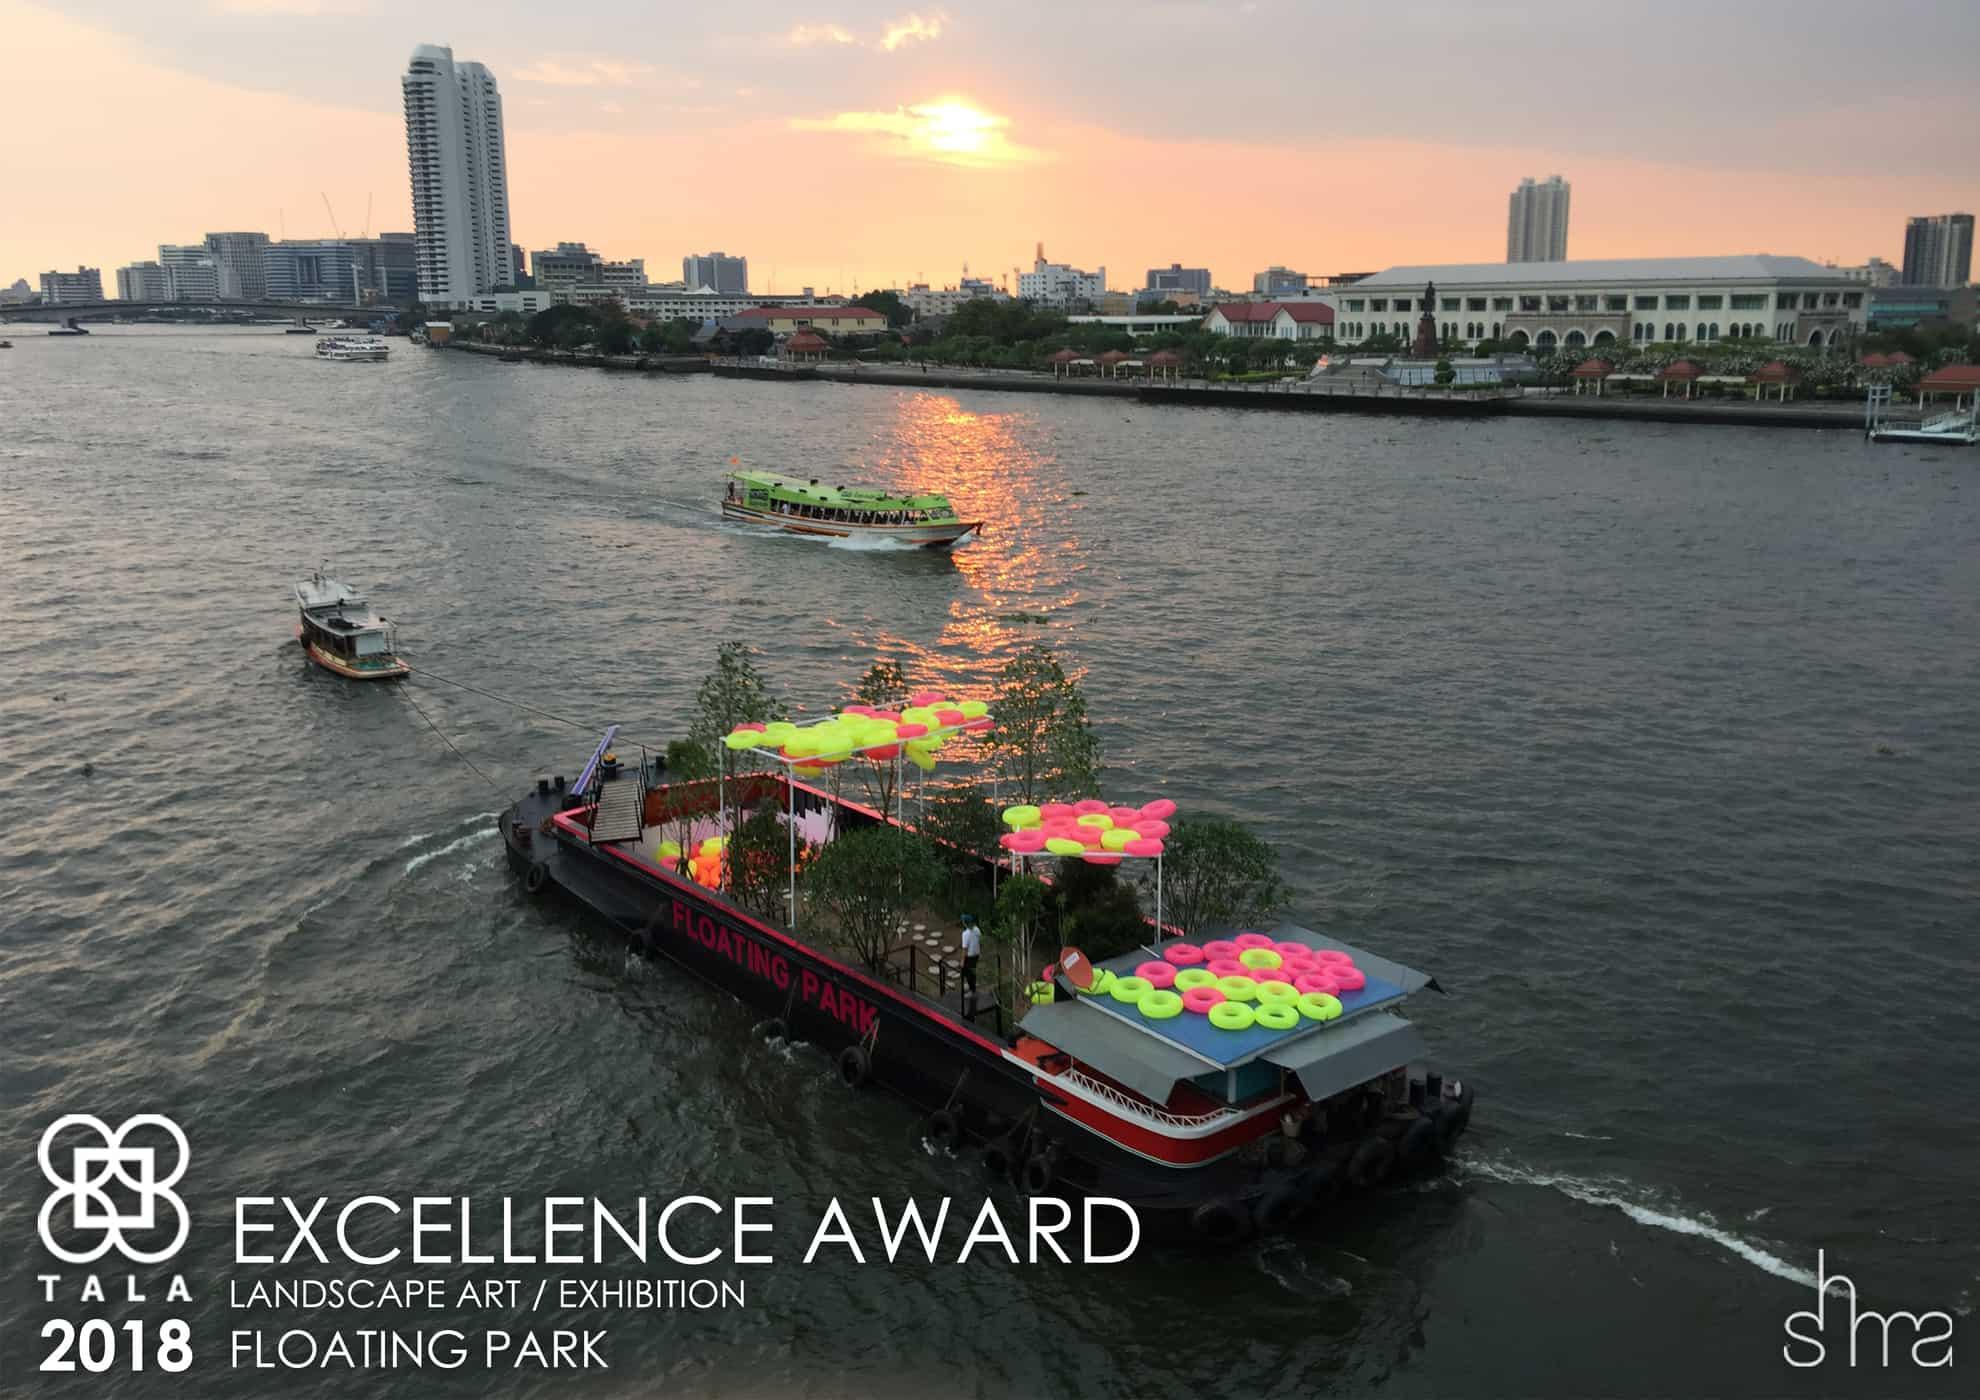 Thailand Association of Landscape Architects